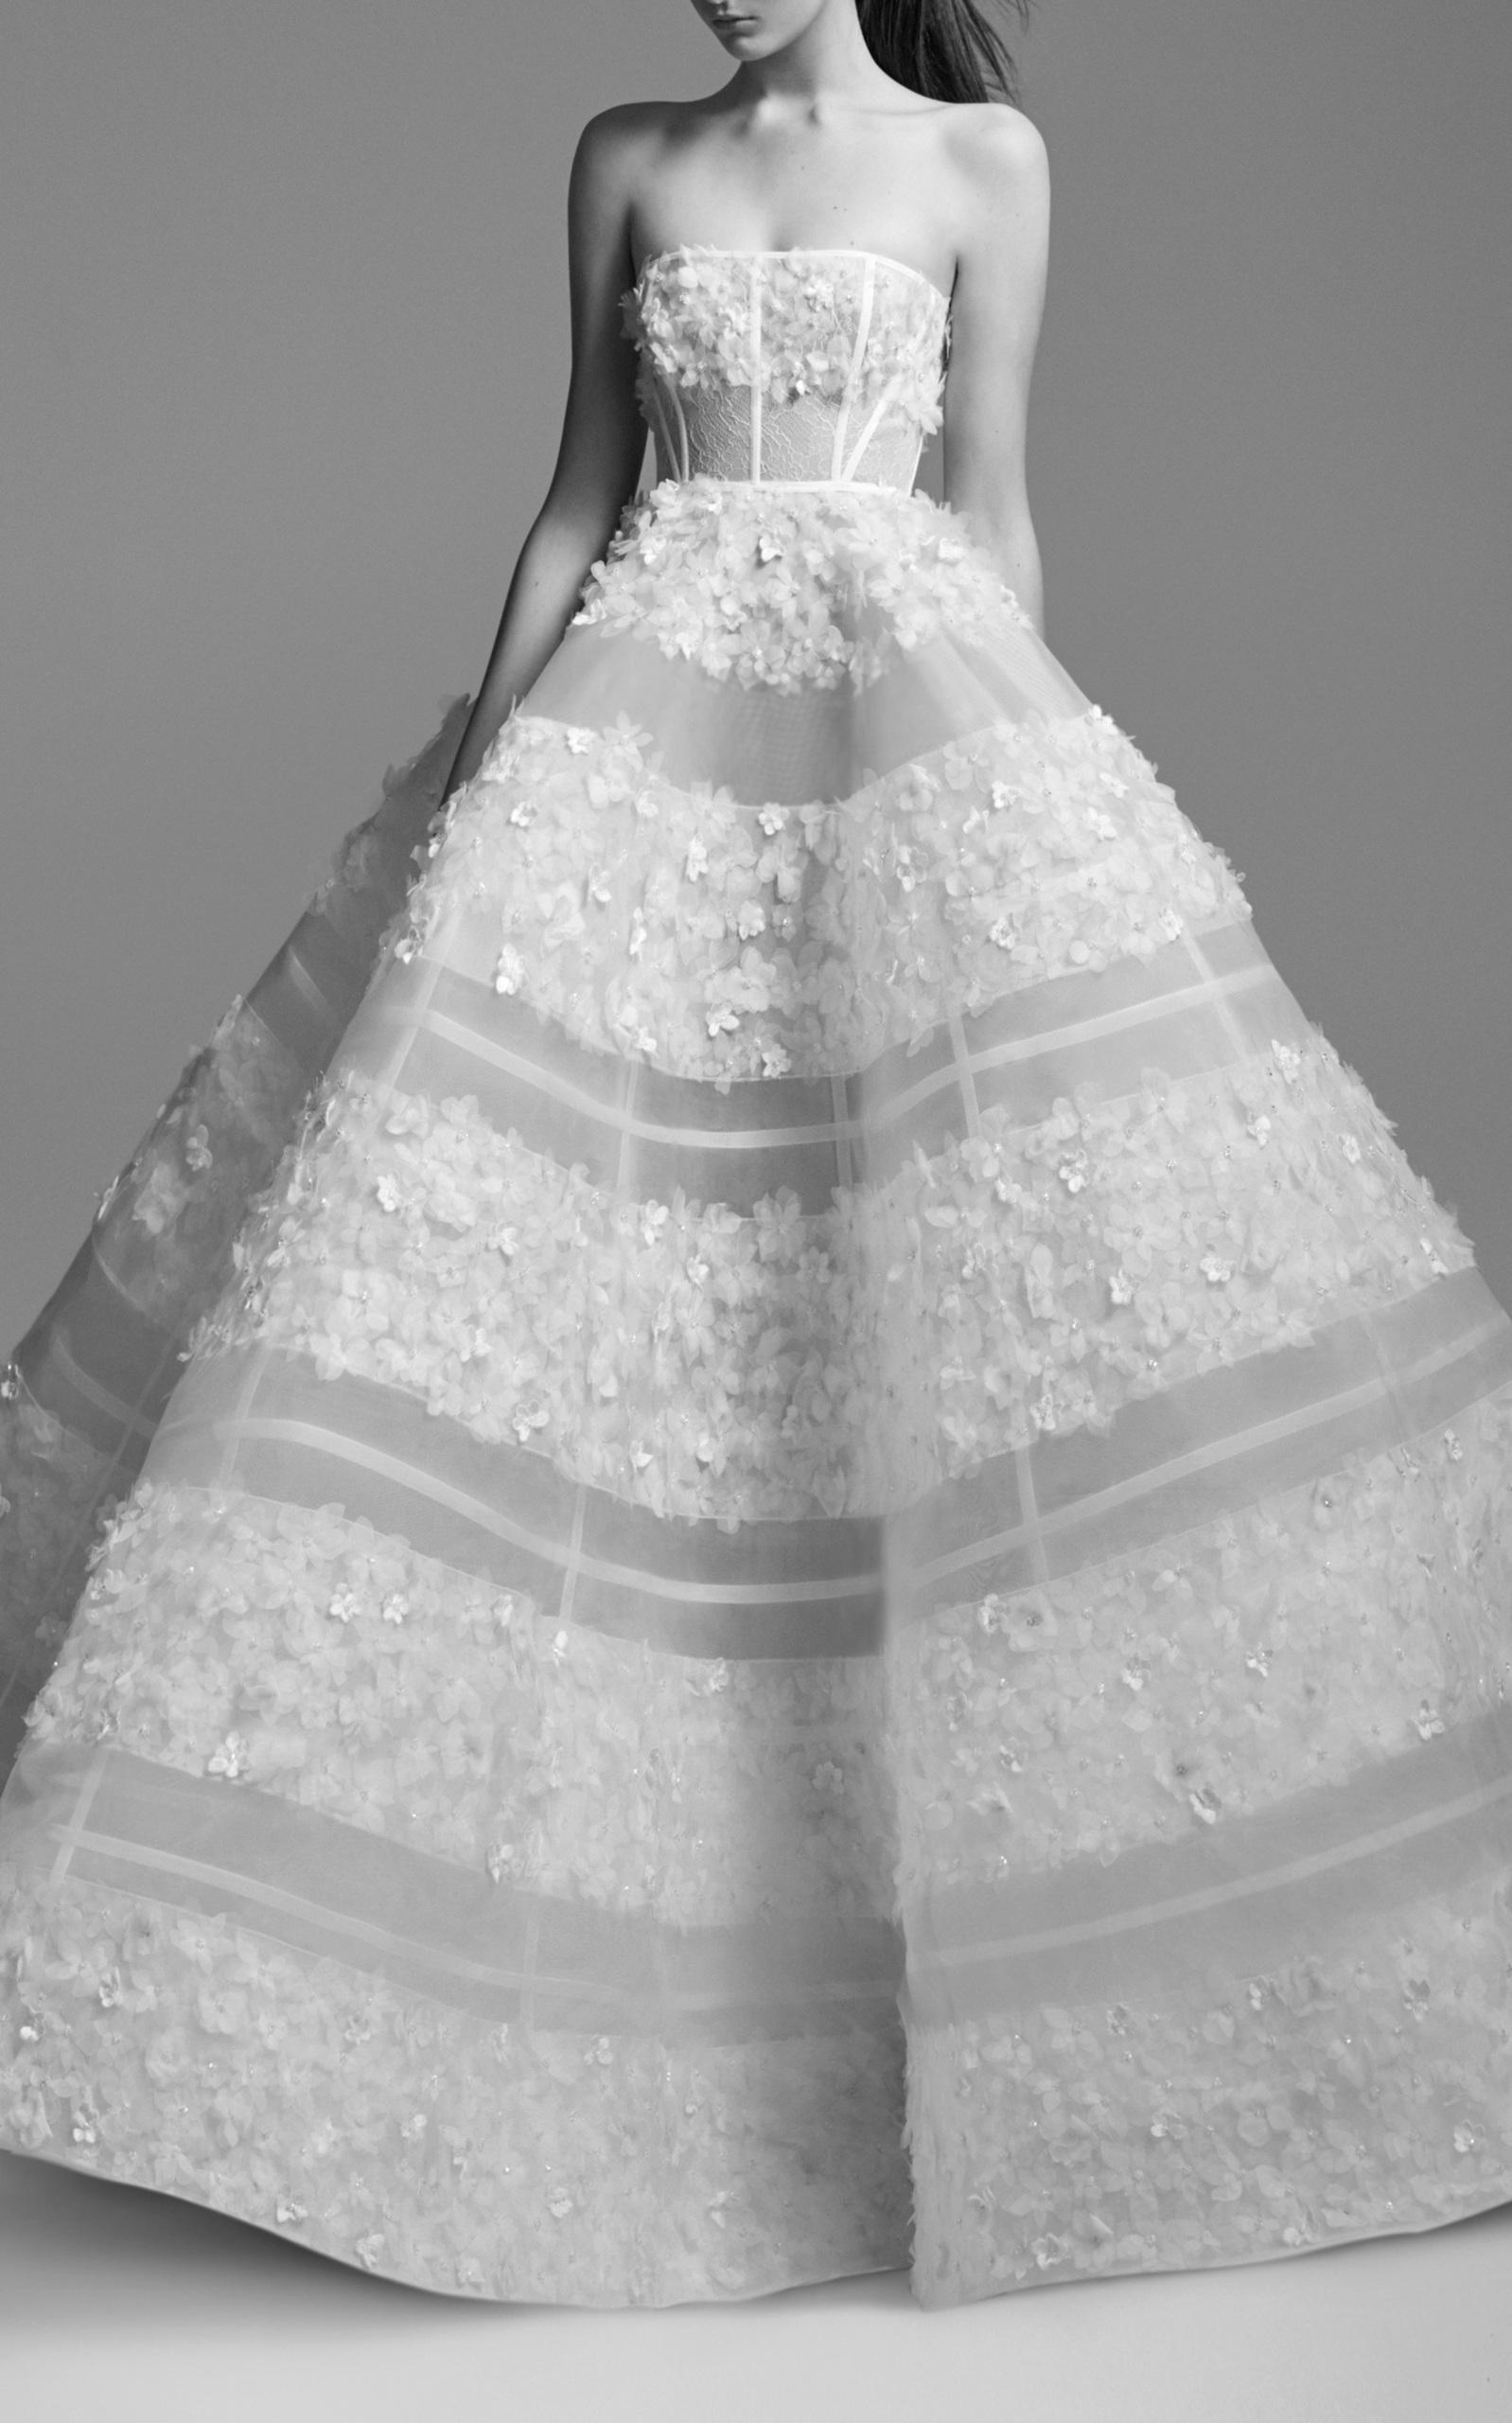 Alex Perry Bride Trunkshow | Moda Operandi